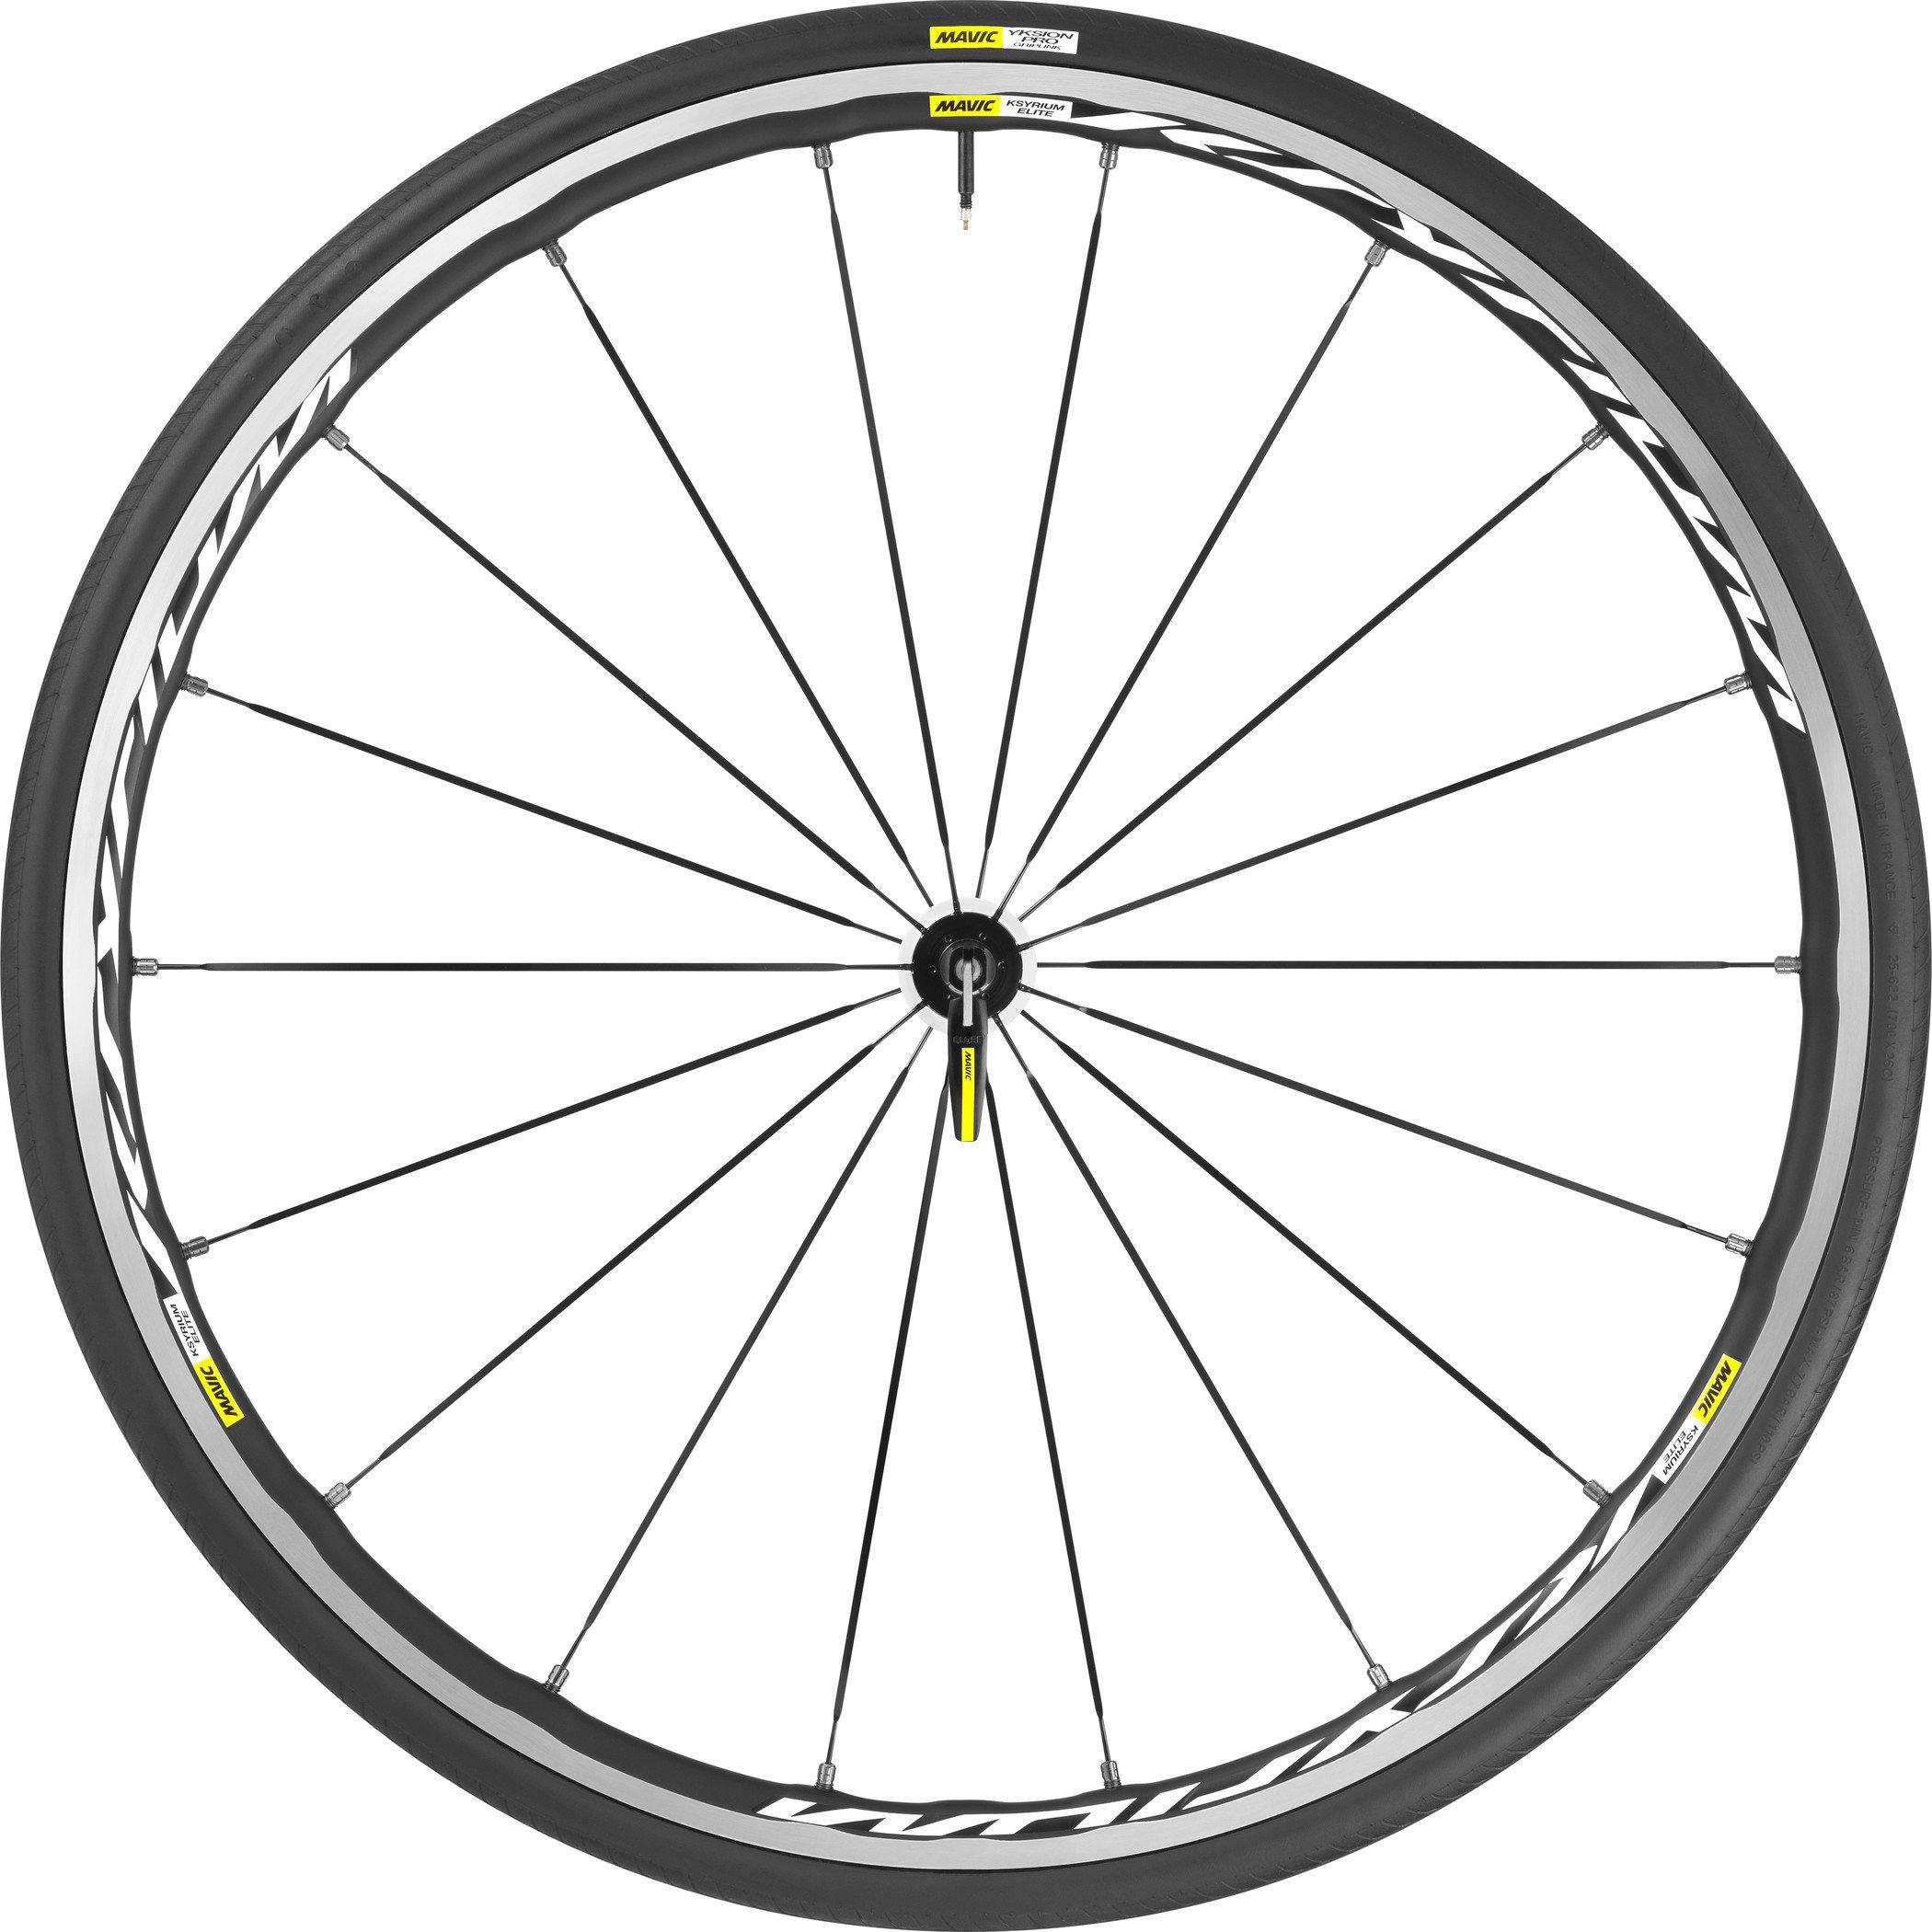 2016 Mavic Ksyrium Elite 25 Front Wheel and Tire System Black